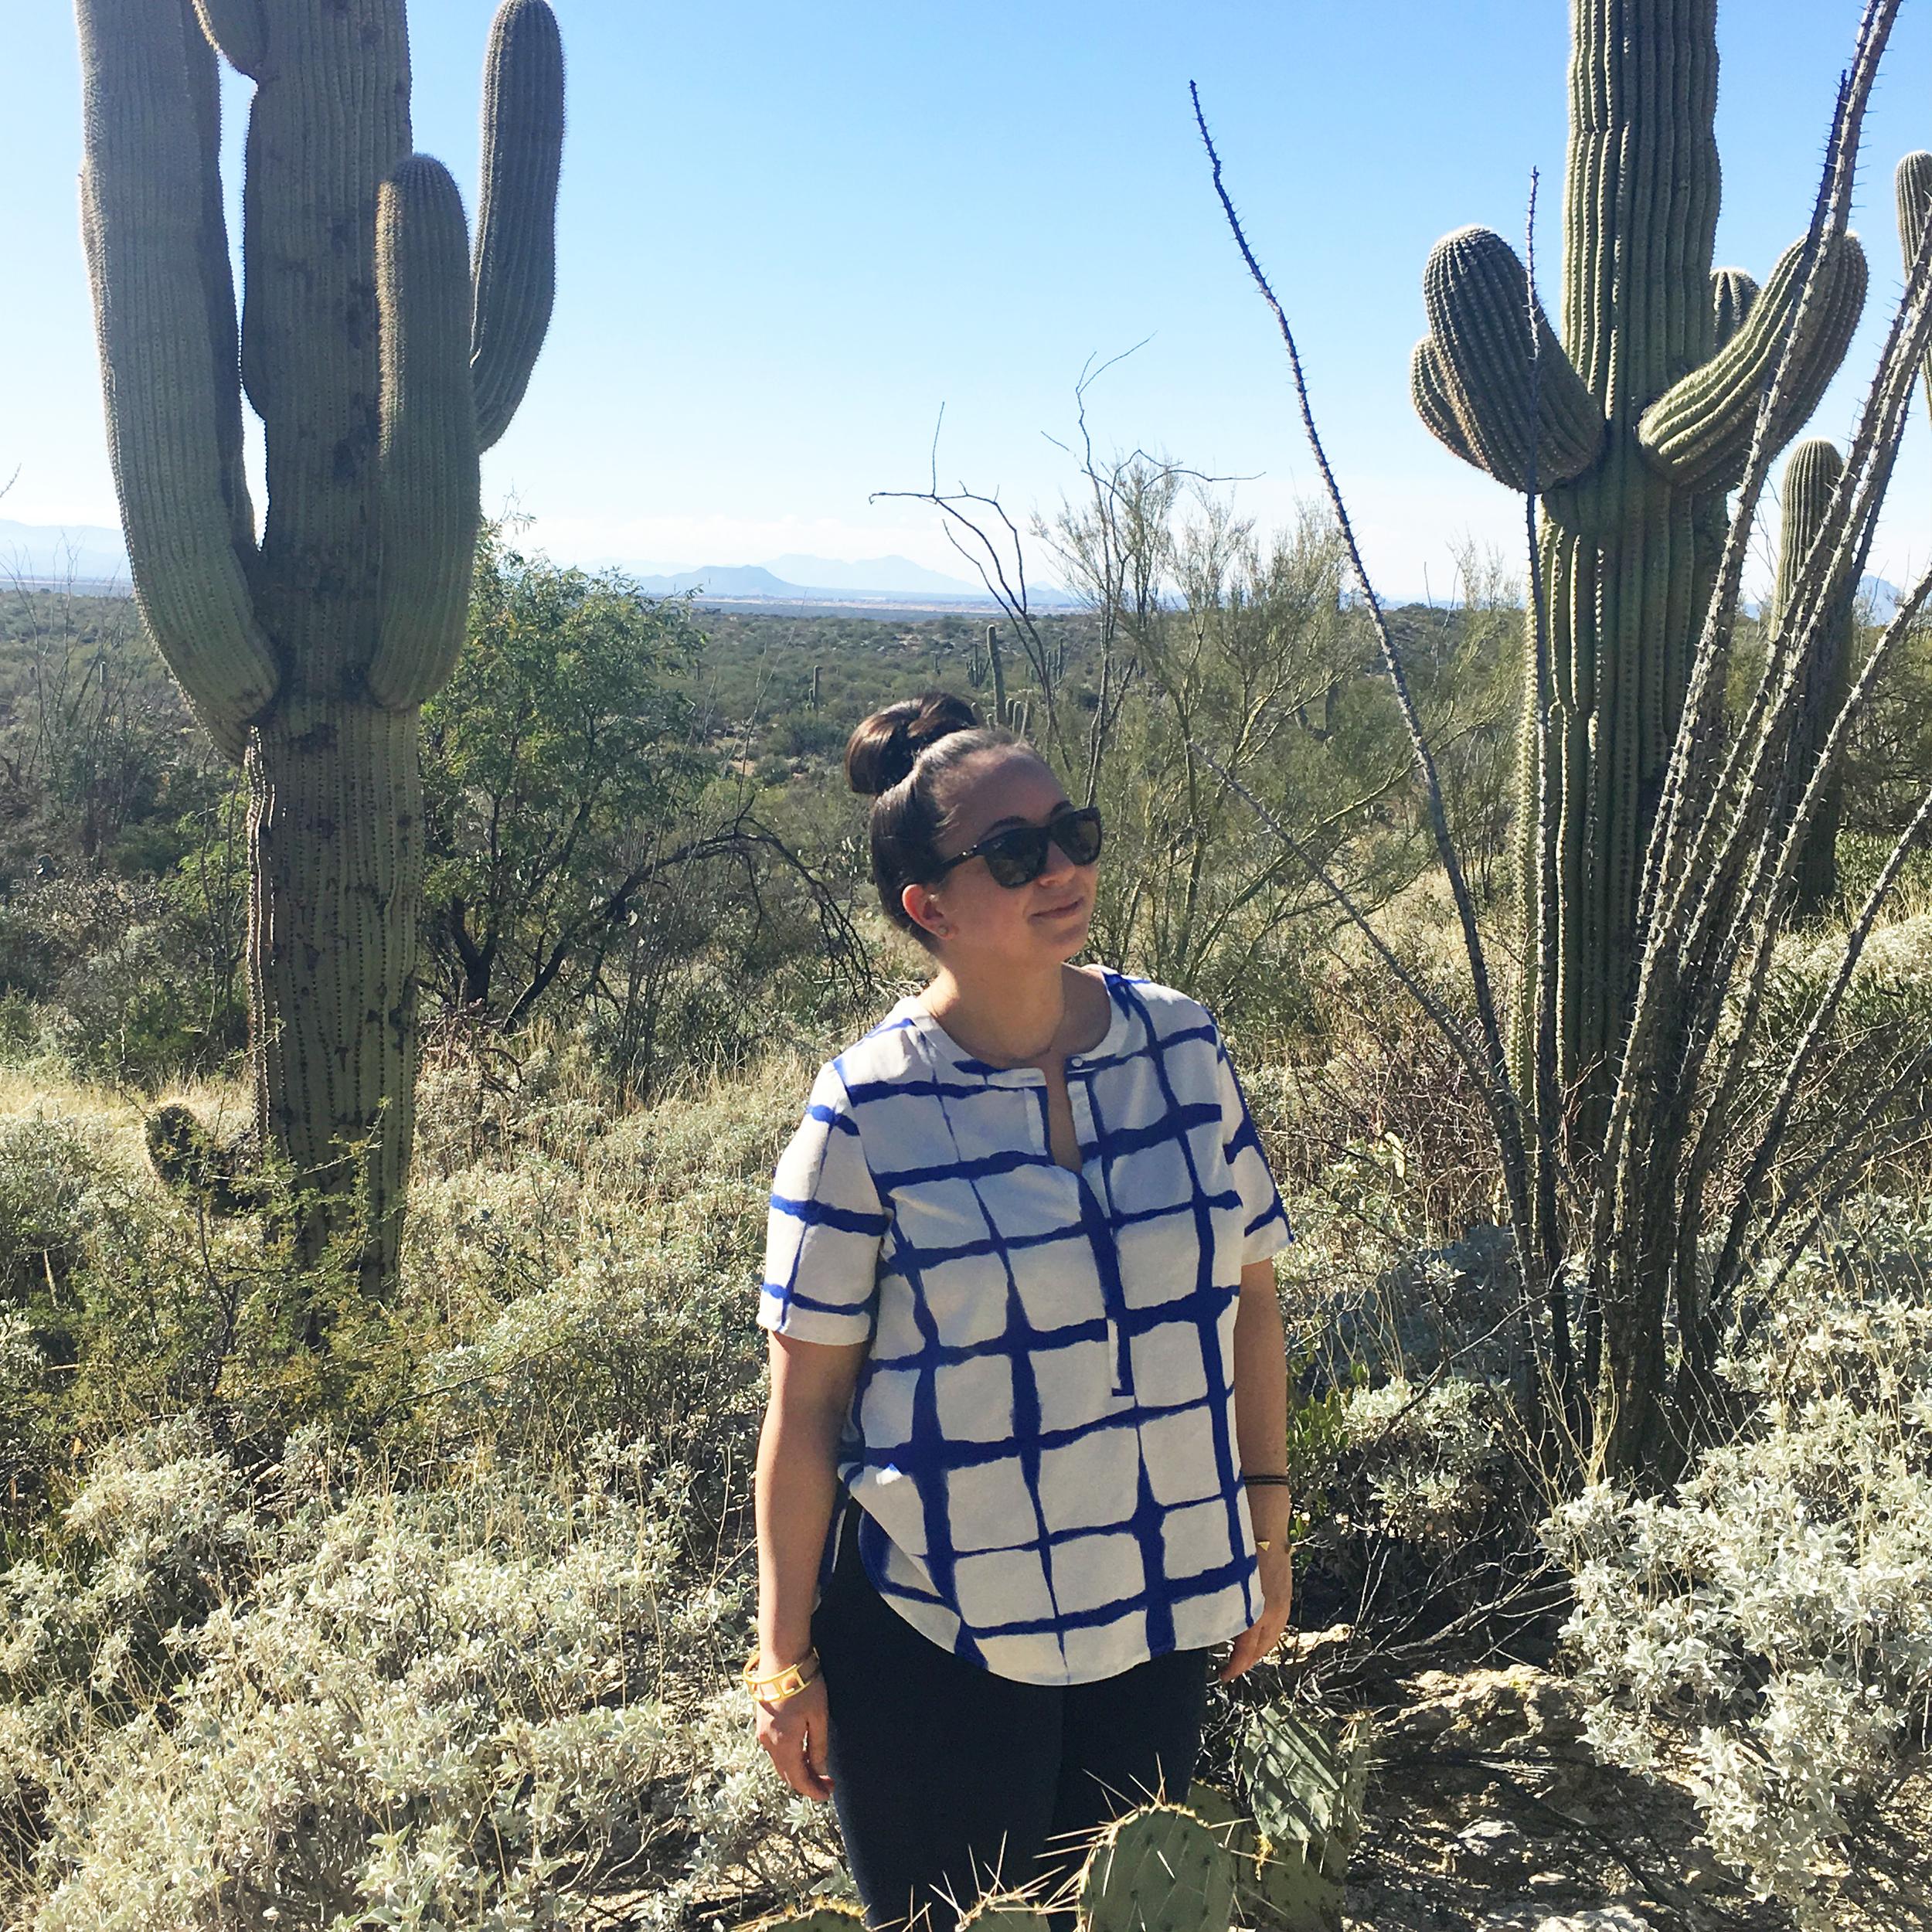 Marveling the monstrous cacti in Saguaro National Park, Tucson AZ